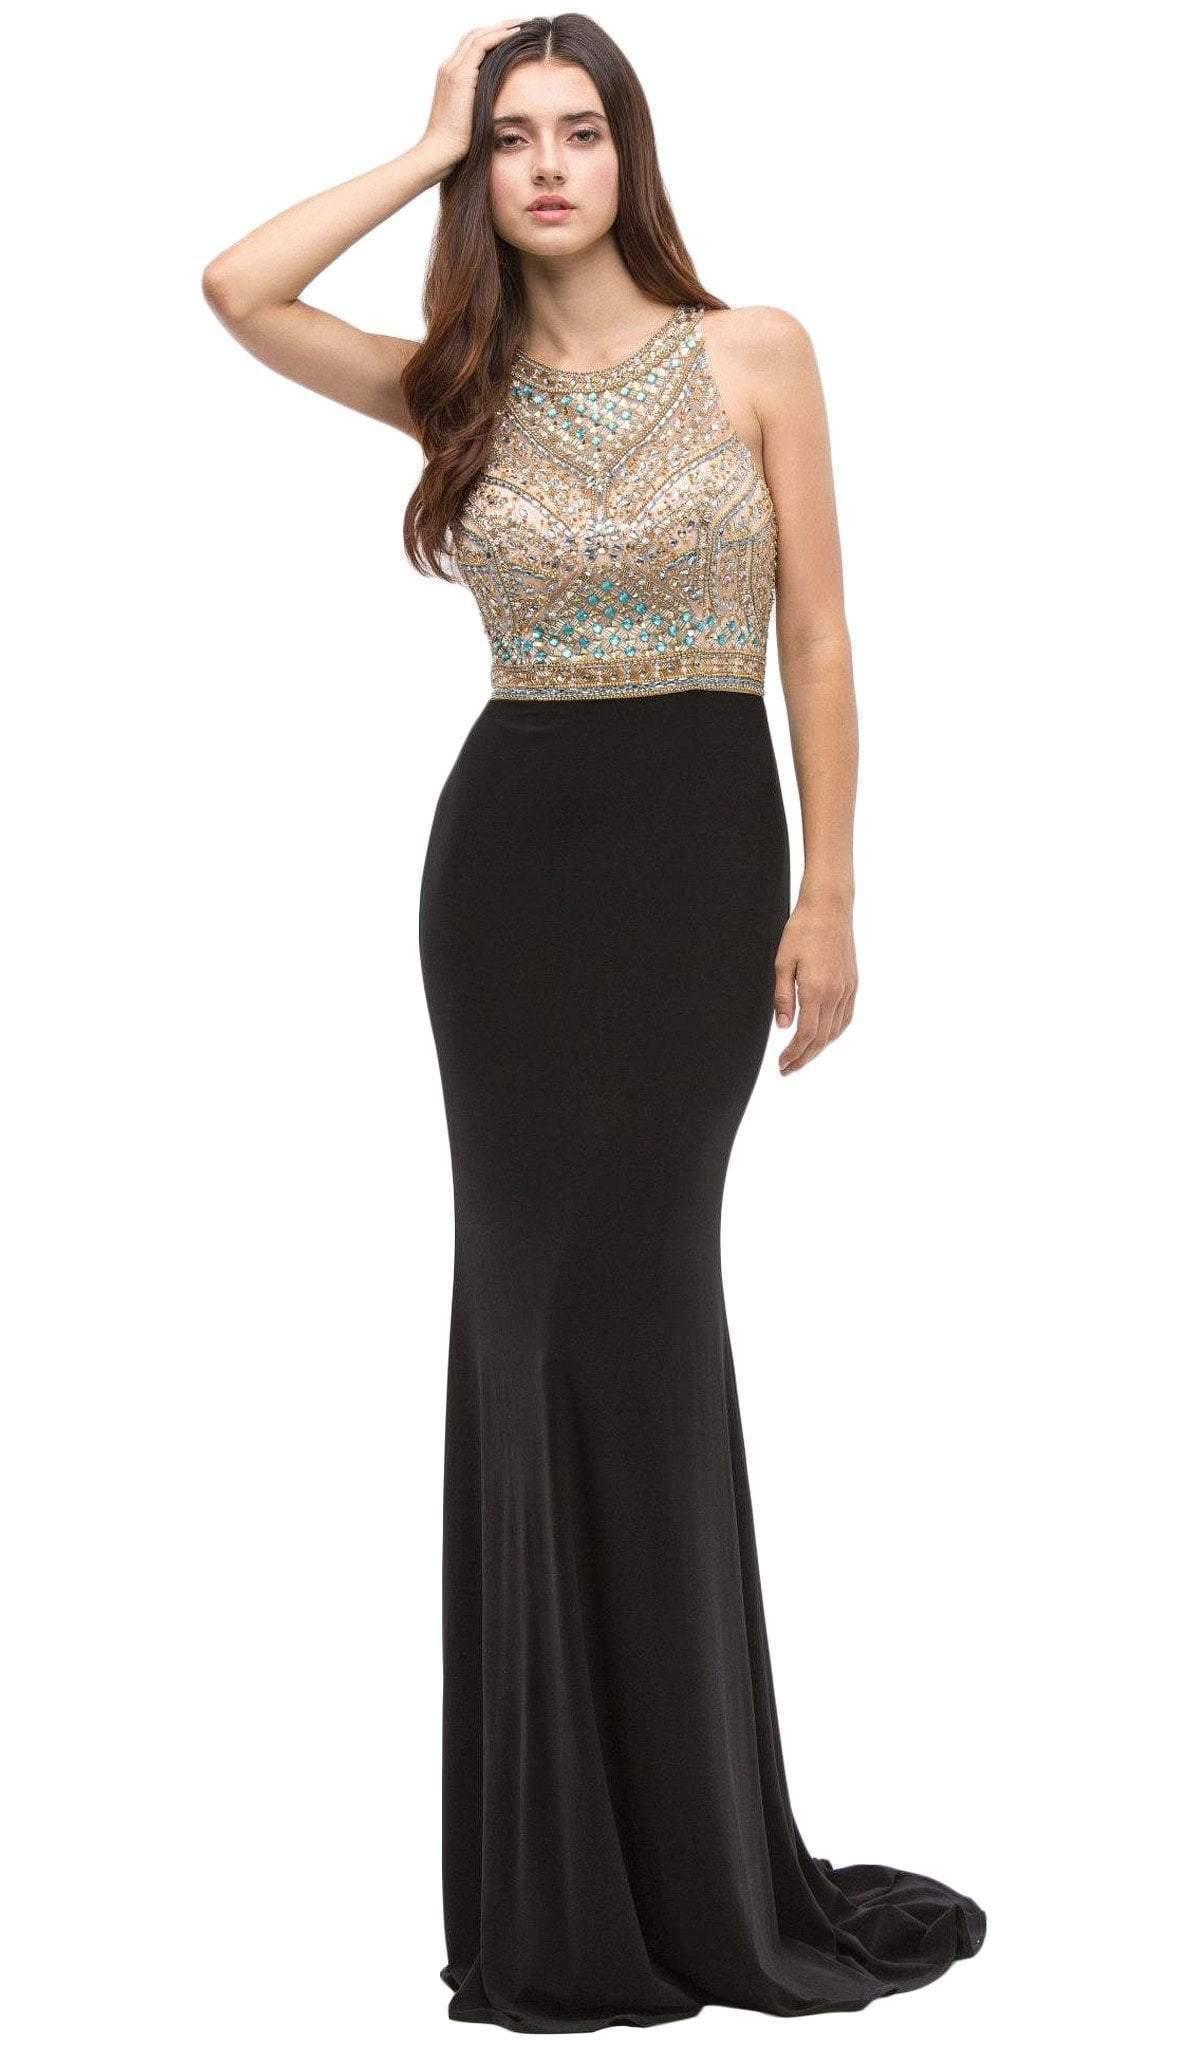 Eureka Fashion - Beaded Halter Neck Jersey Sheath Evening Dress